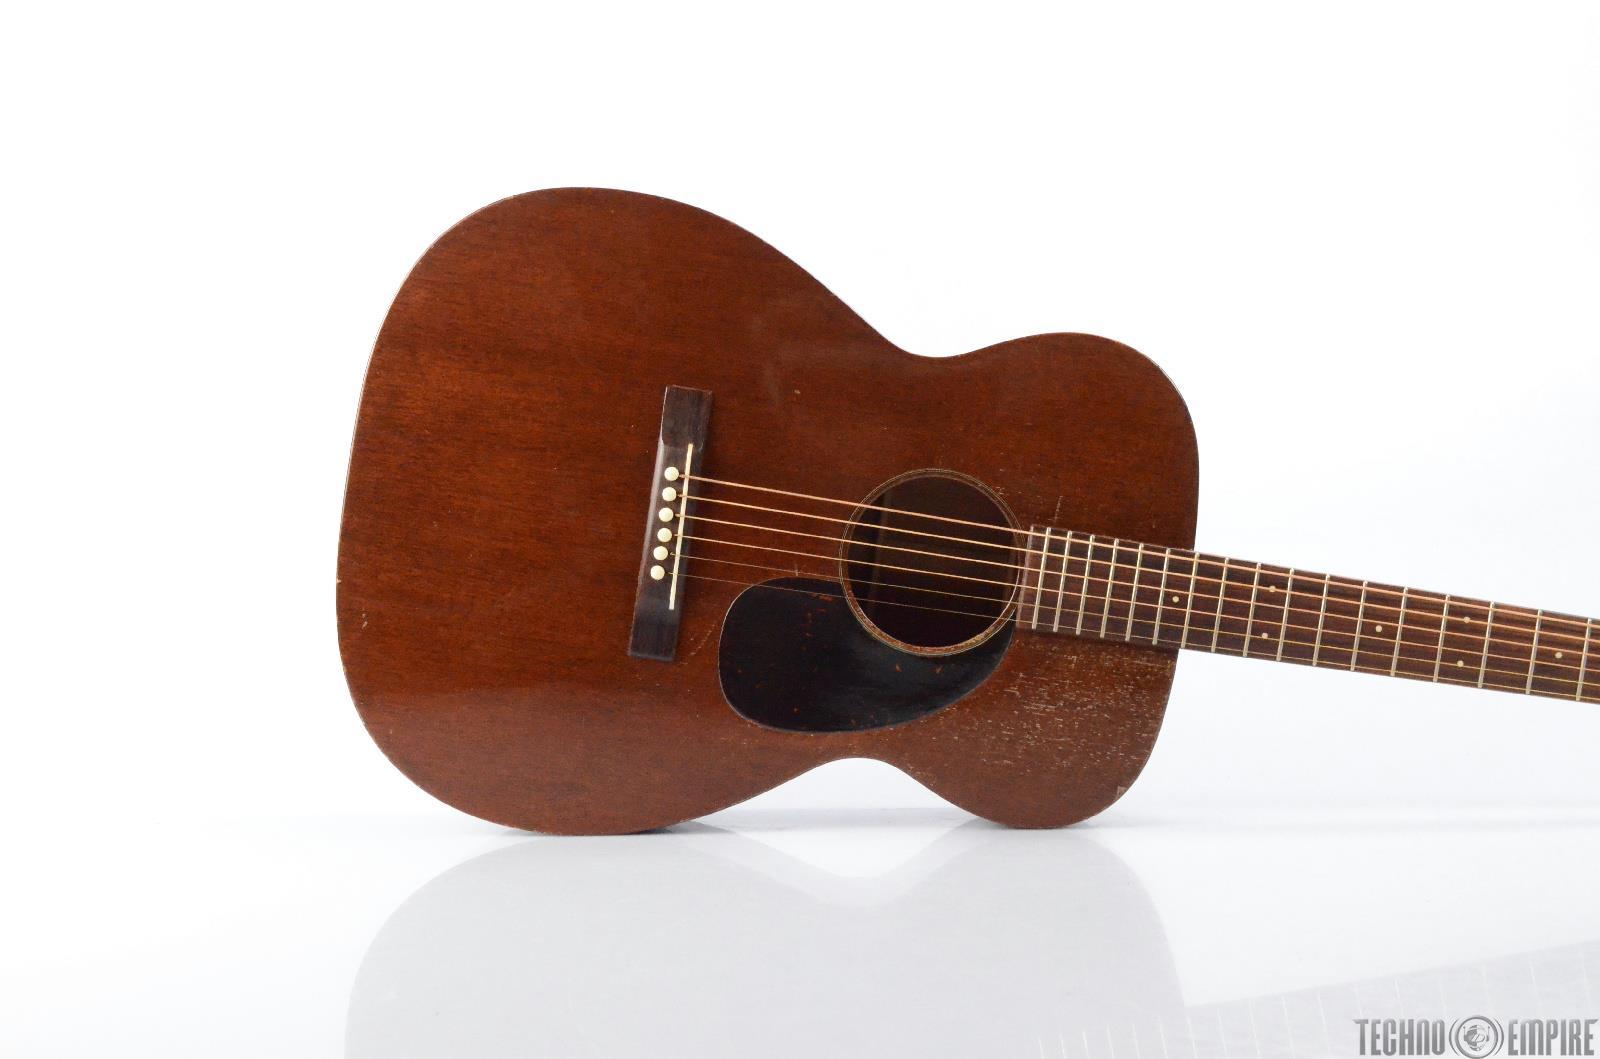 1955 Martin 00-17 Orchestra Acoustic Guitar w/ Hard Gig Case #29238